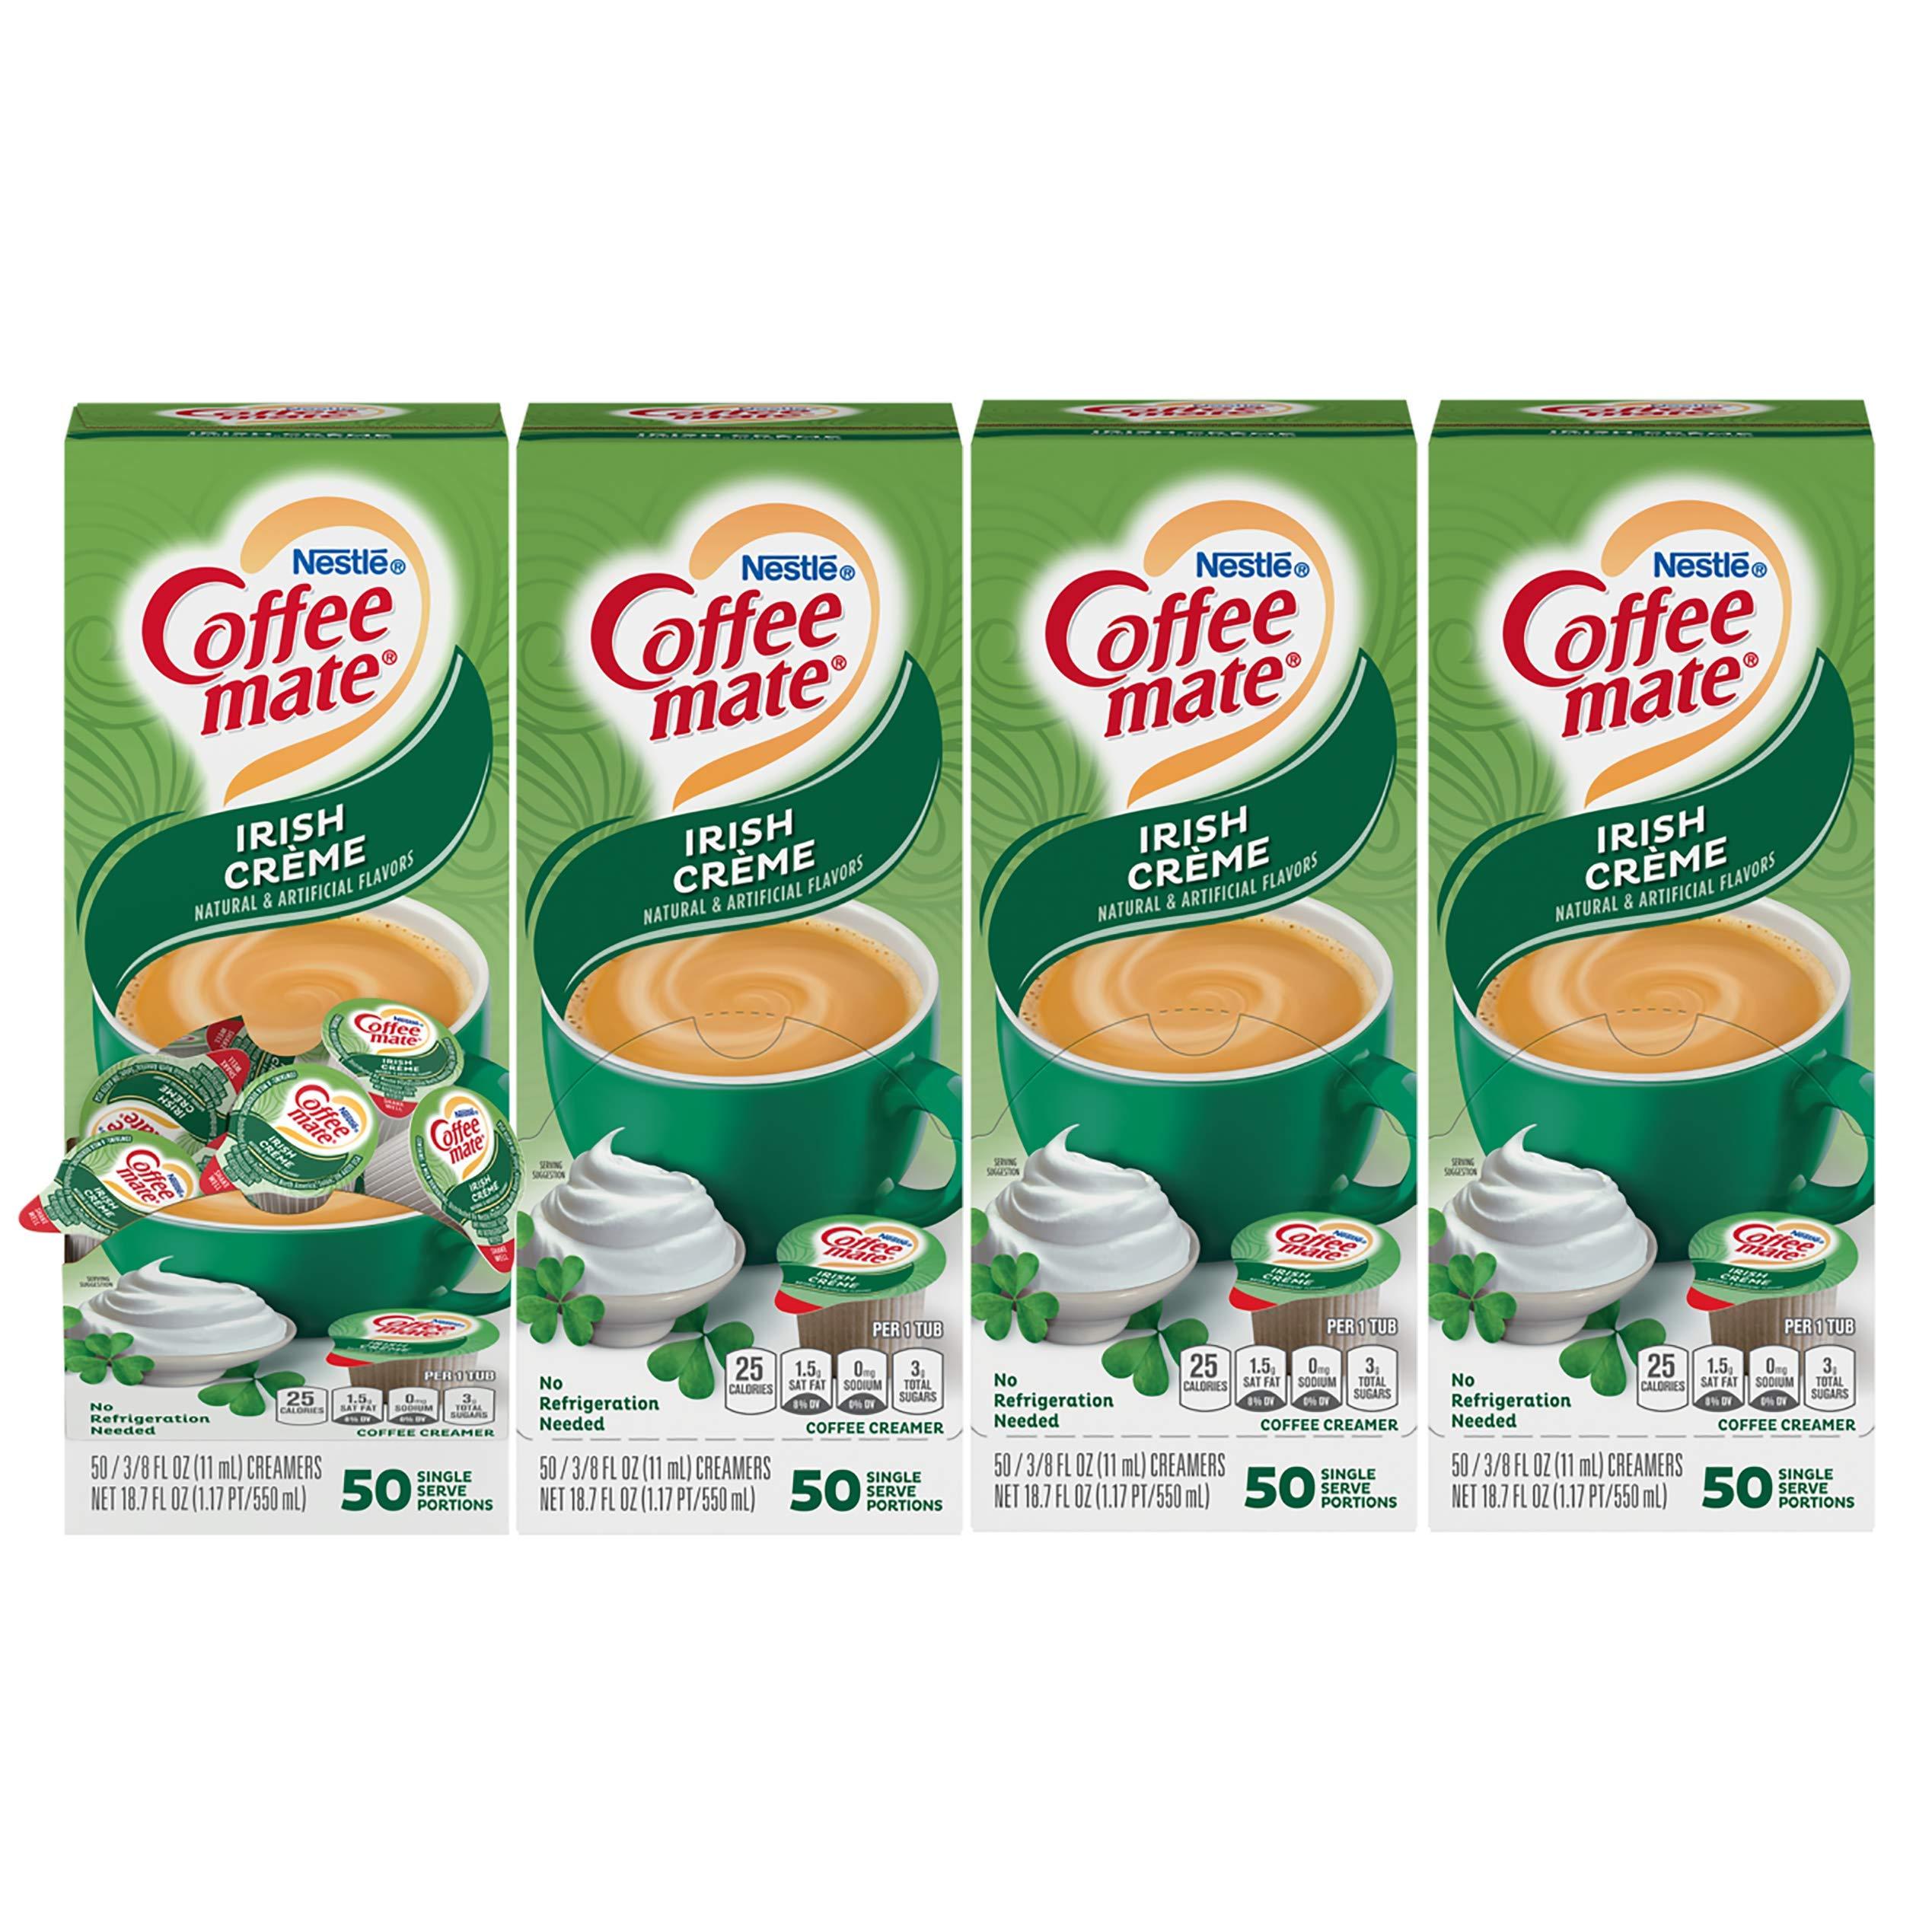 Nestle Coffee mate Coffee Creamer, Irish Creme, Liquid Creamer Singles, Non Dairy, No Refrigeration, Box of 50 Singles (Pack of 4)